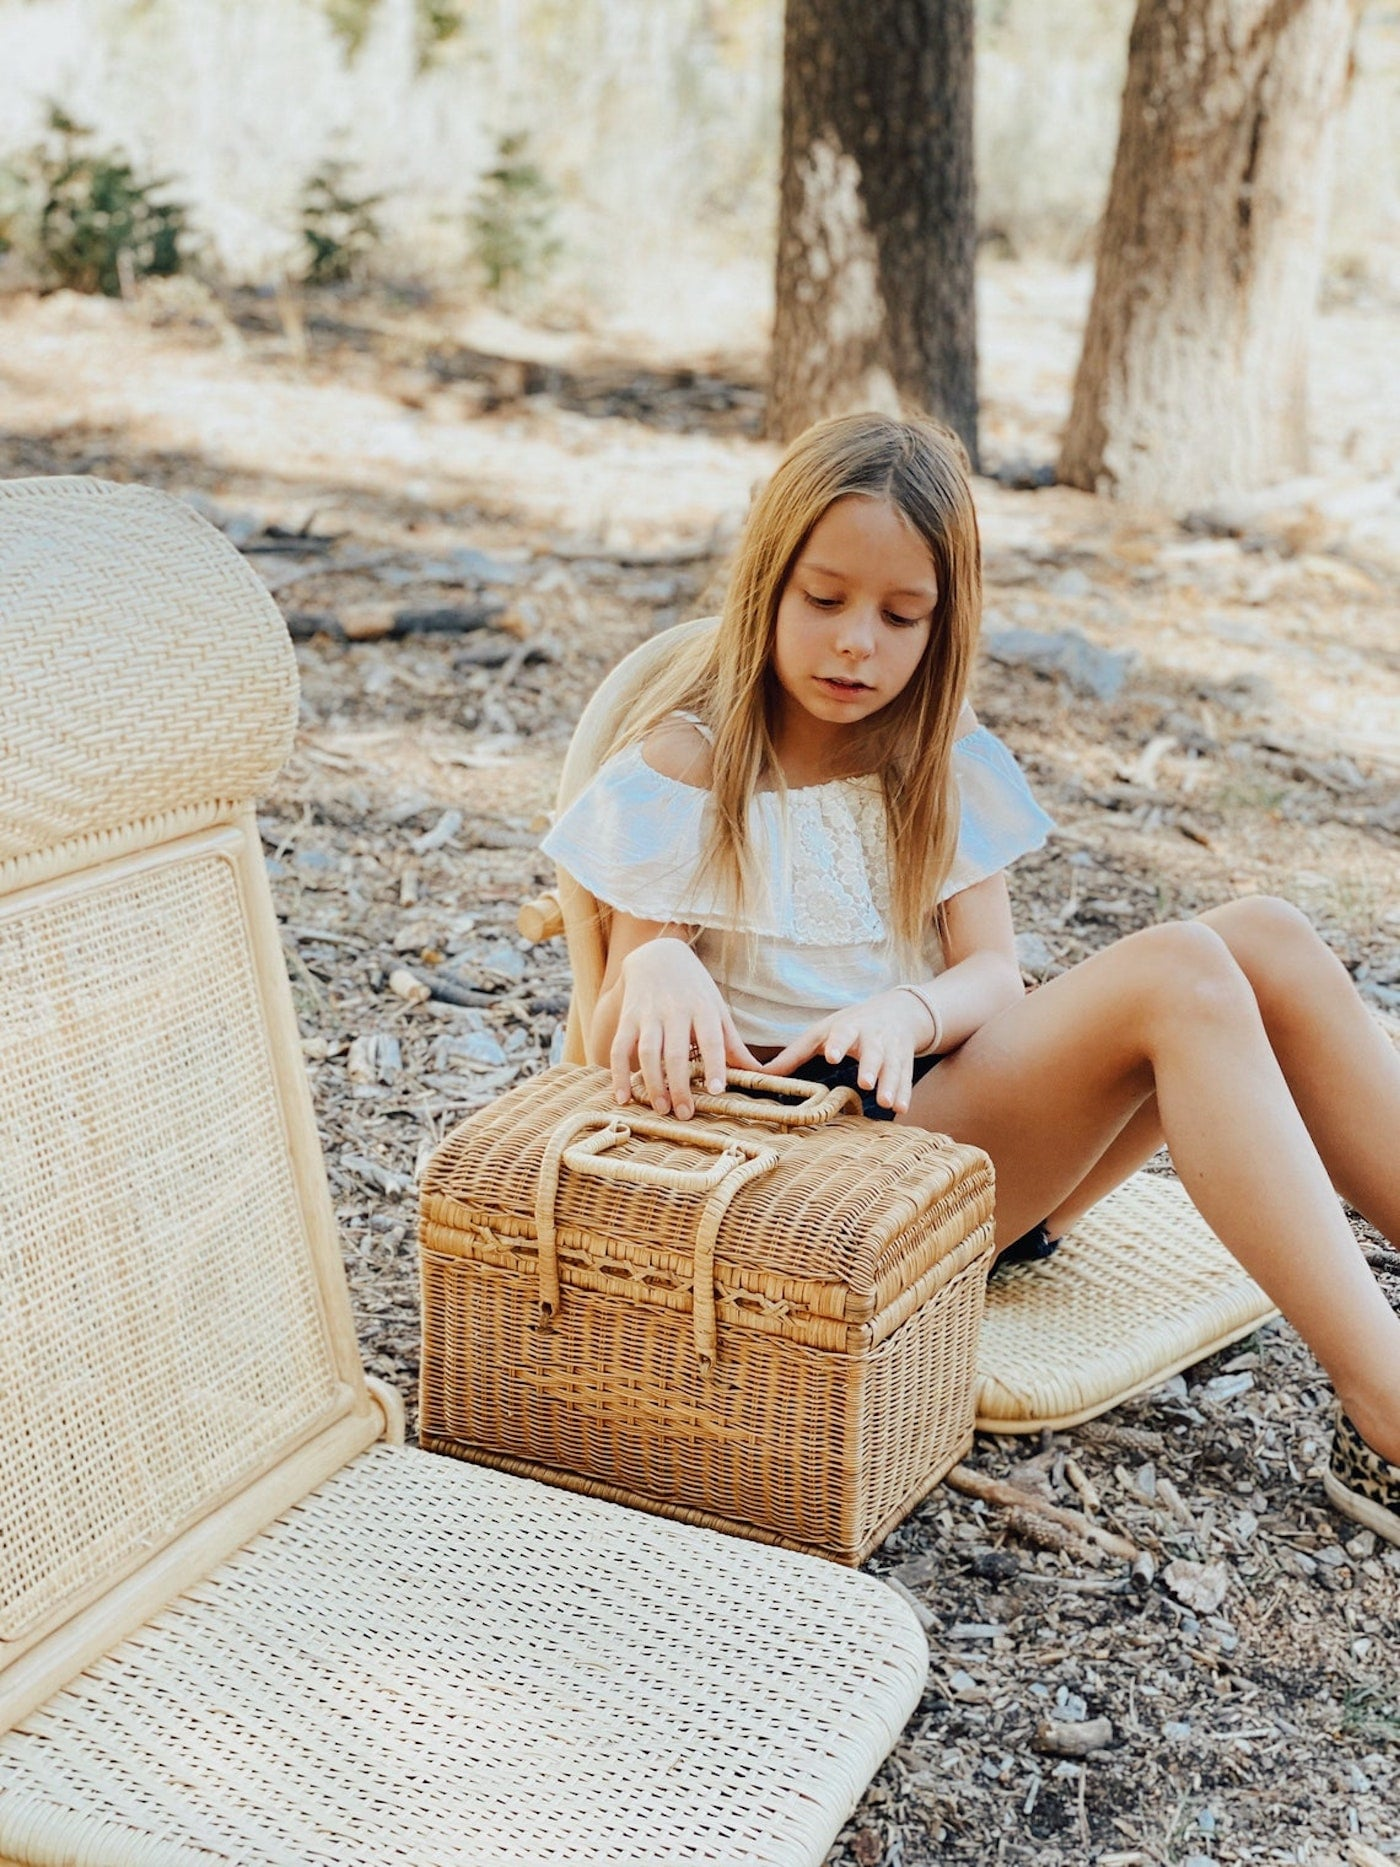 Girl sitting on rattan picnic chair